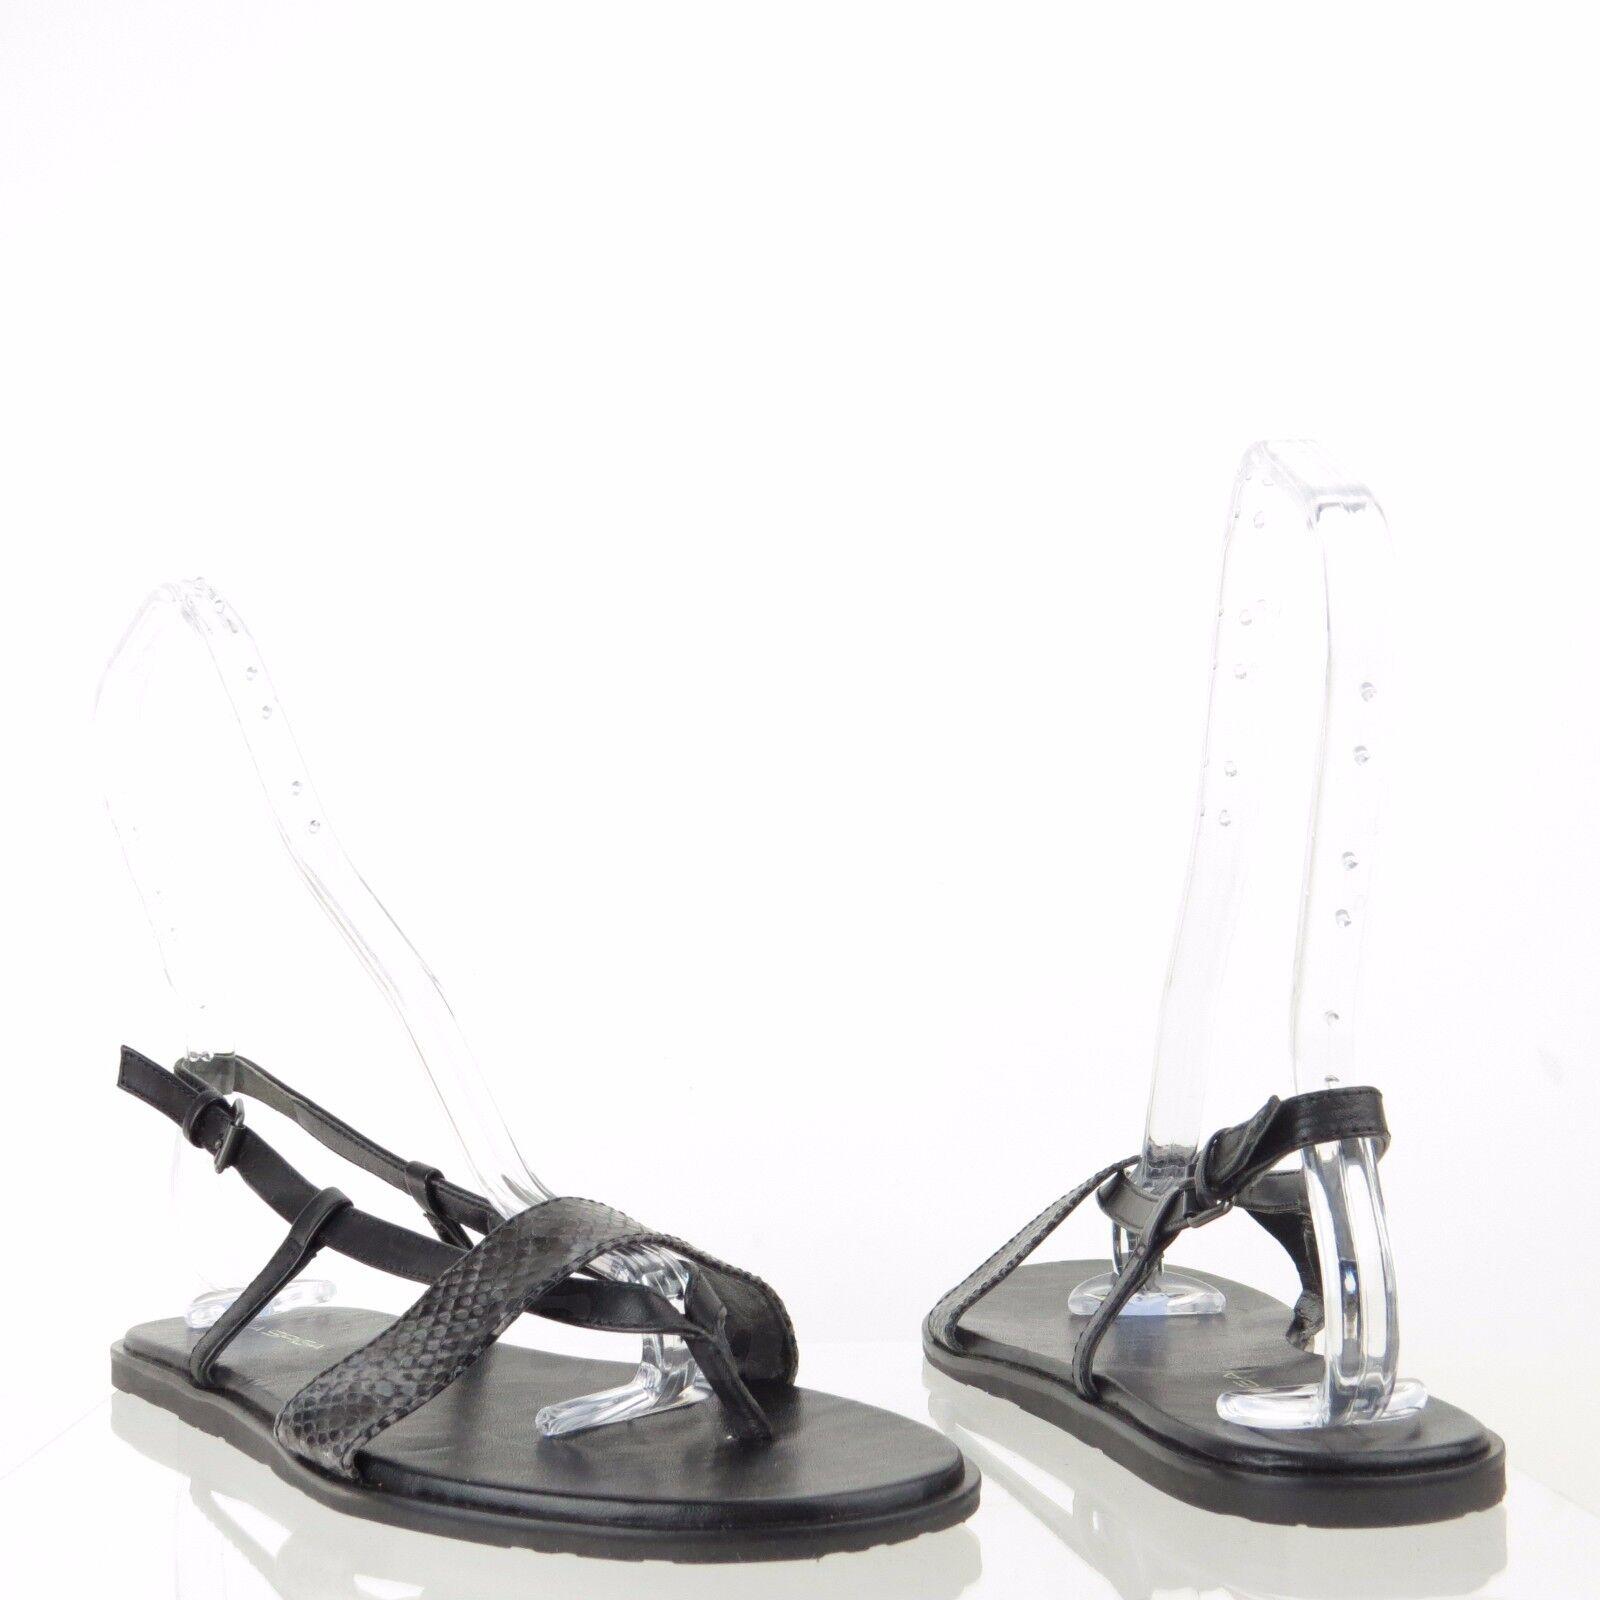 Via Spiga Alena Womens shoes Black Leather Snakeprint Thong Sandals Sz 8.5 M NEW